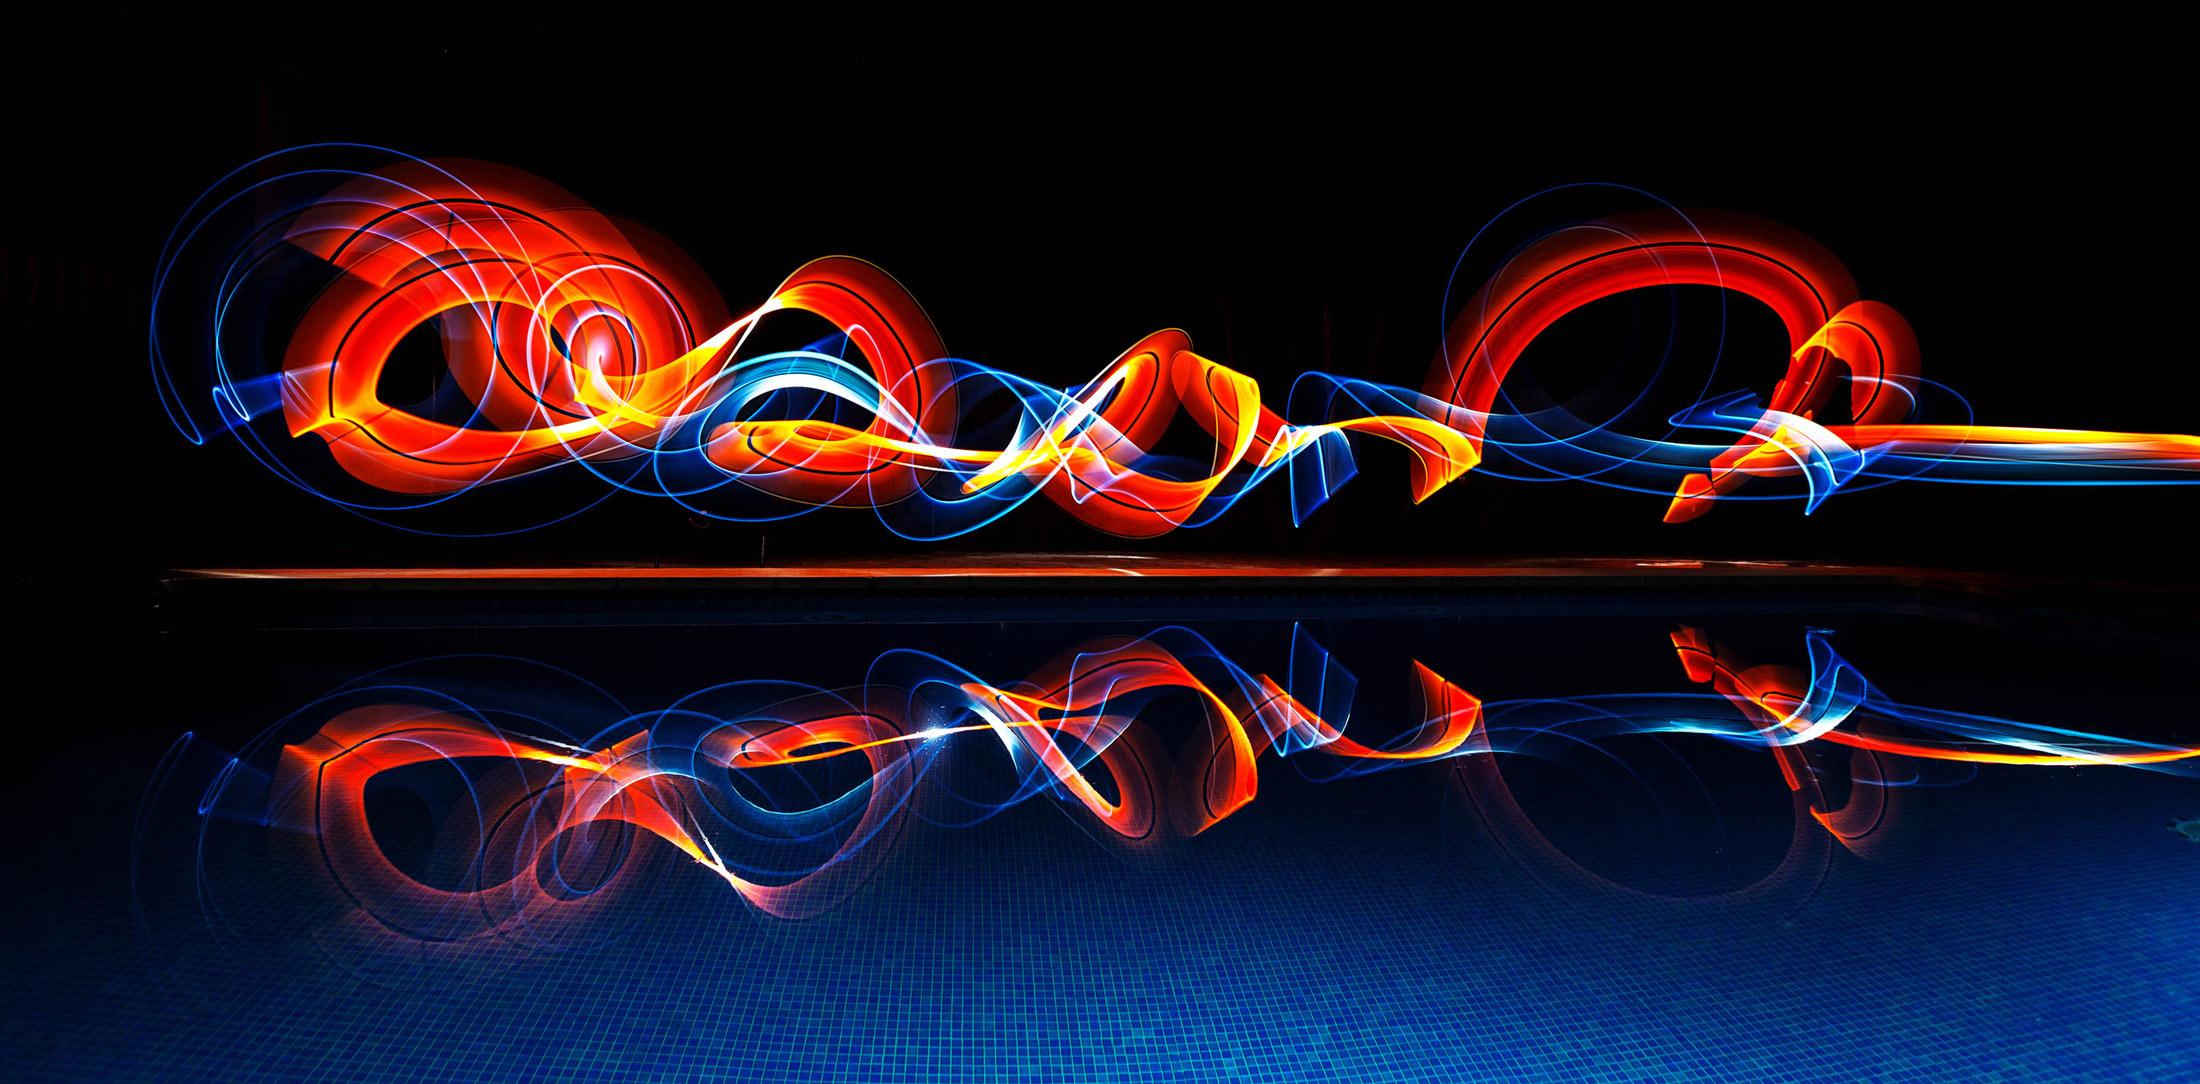 LightPainting-Gunnar-Heilmann-pool-freehand-tube-reflection-light.jpg